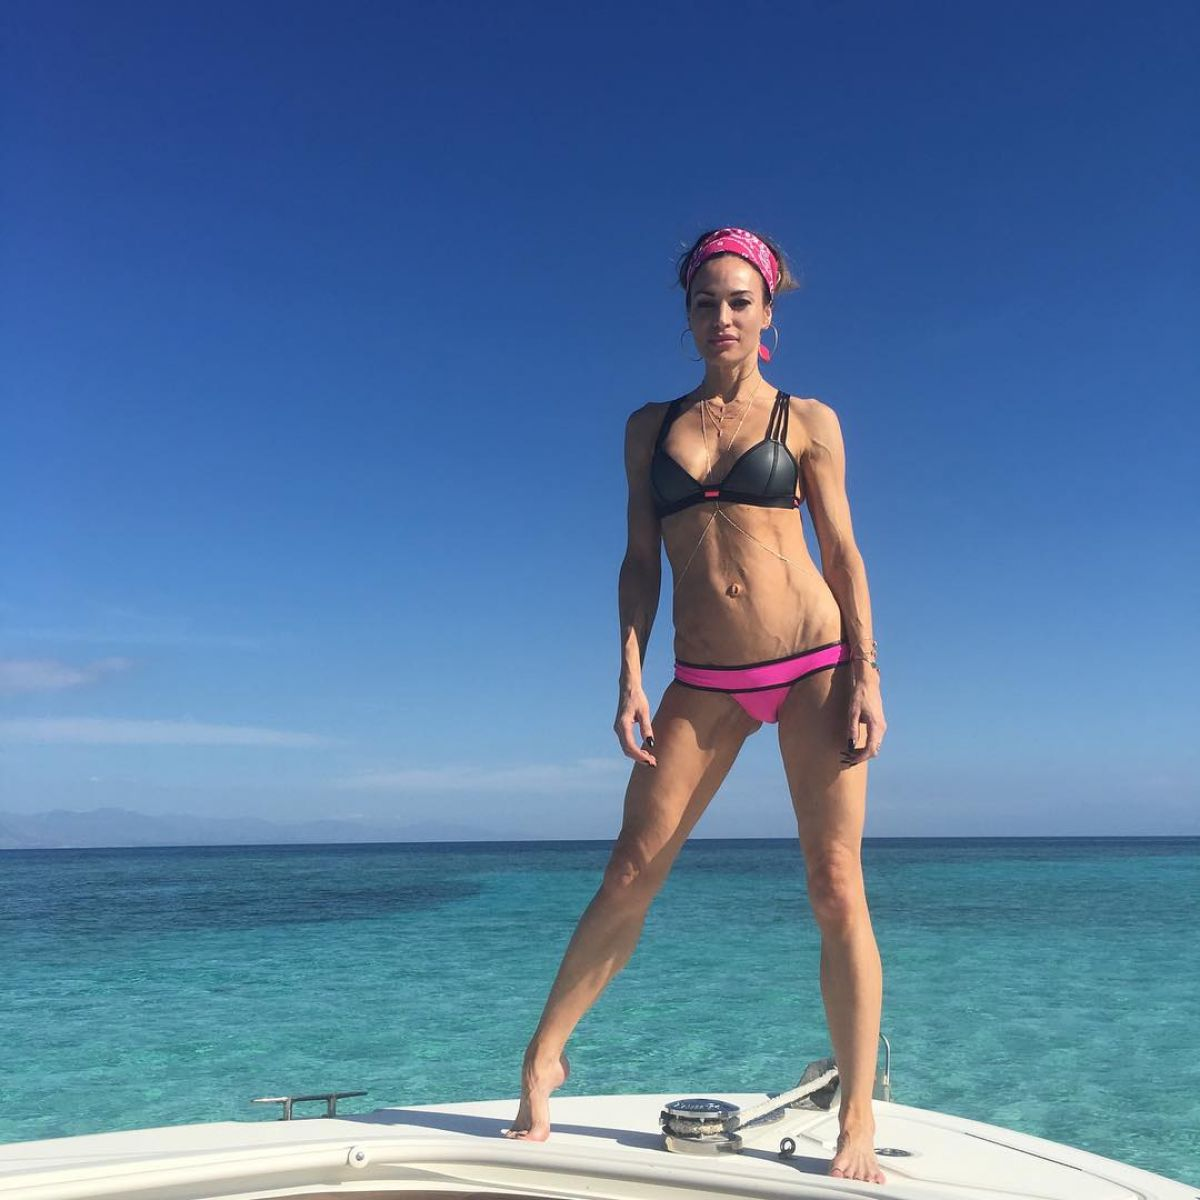 Jolene van vugt shots in bikini — img 8